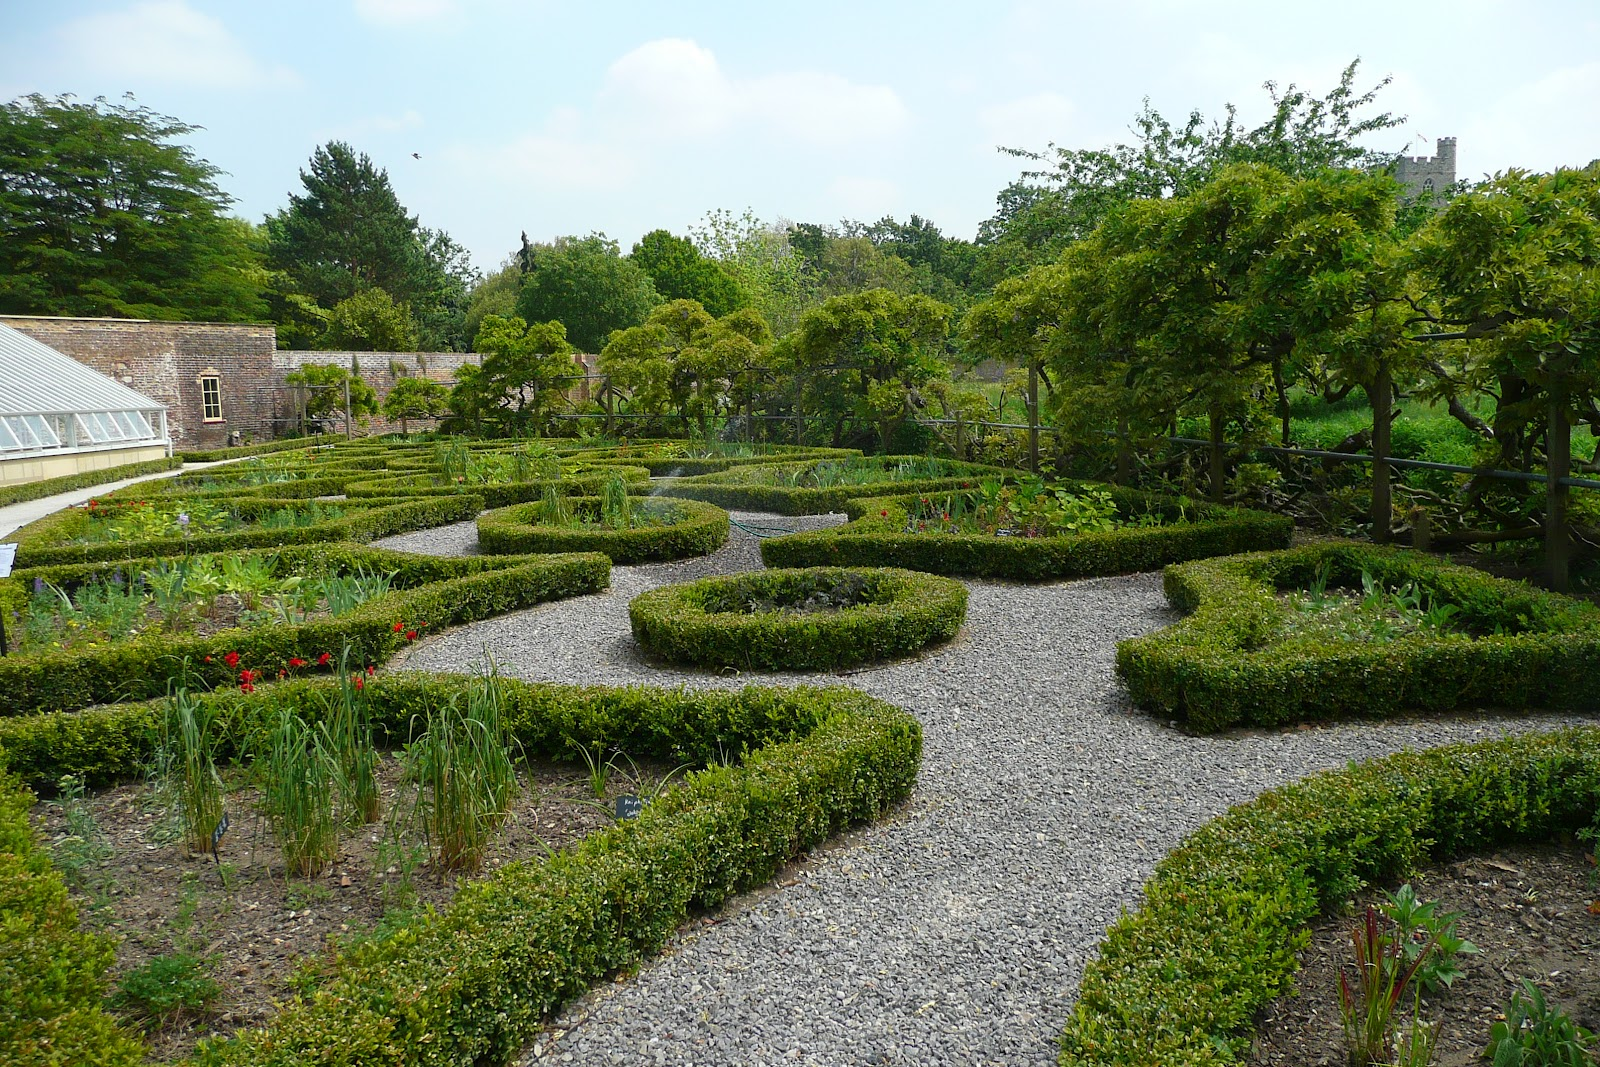 http://1.bp.blogspot.com/-8jNaKArwjIE/T83lAdYonMI/AAAAAAAAAR0/iaJlPymuqYs/s1600/London+kew+gardens+005.JPG